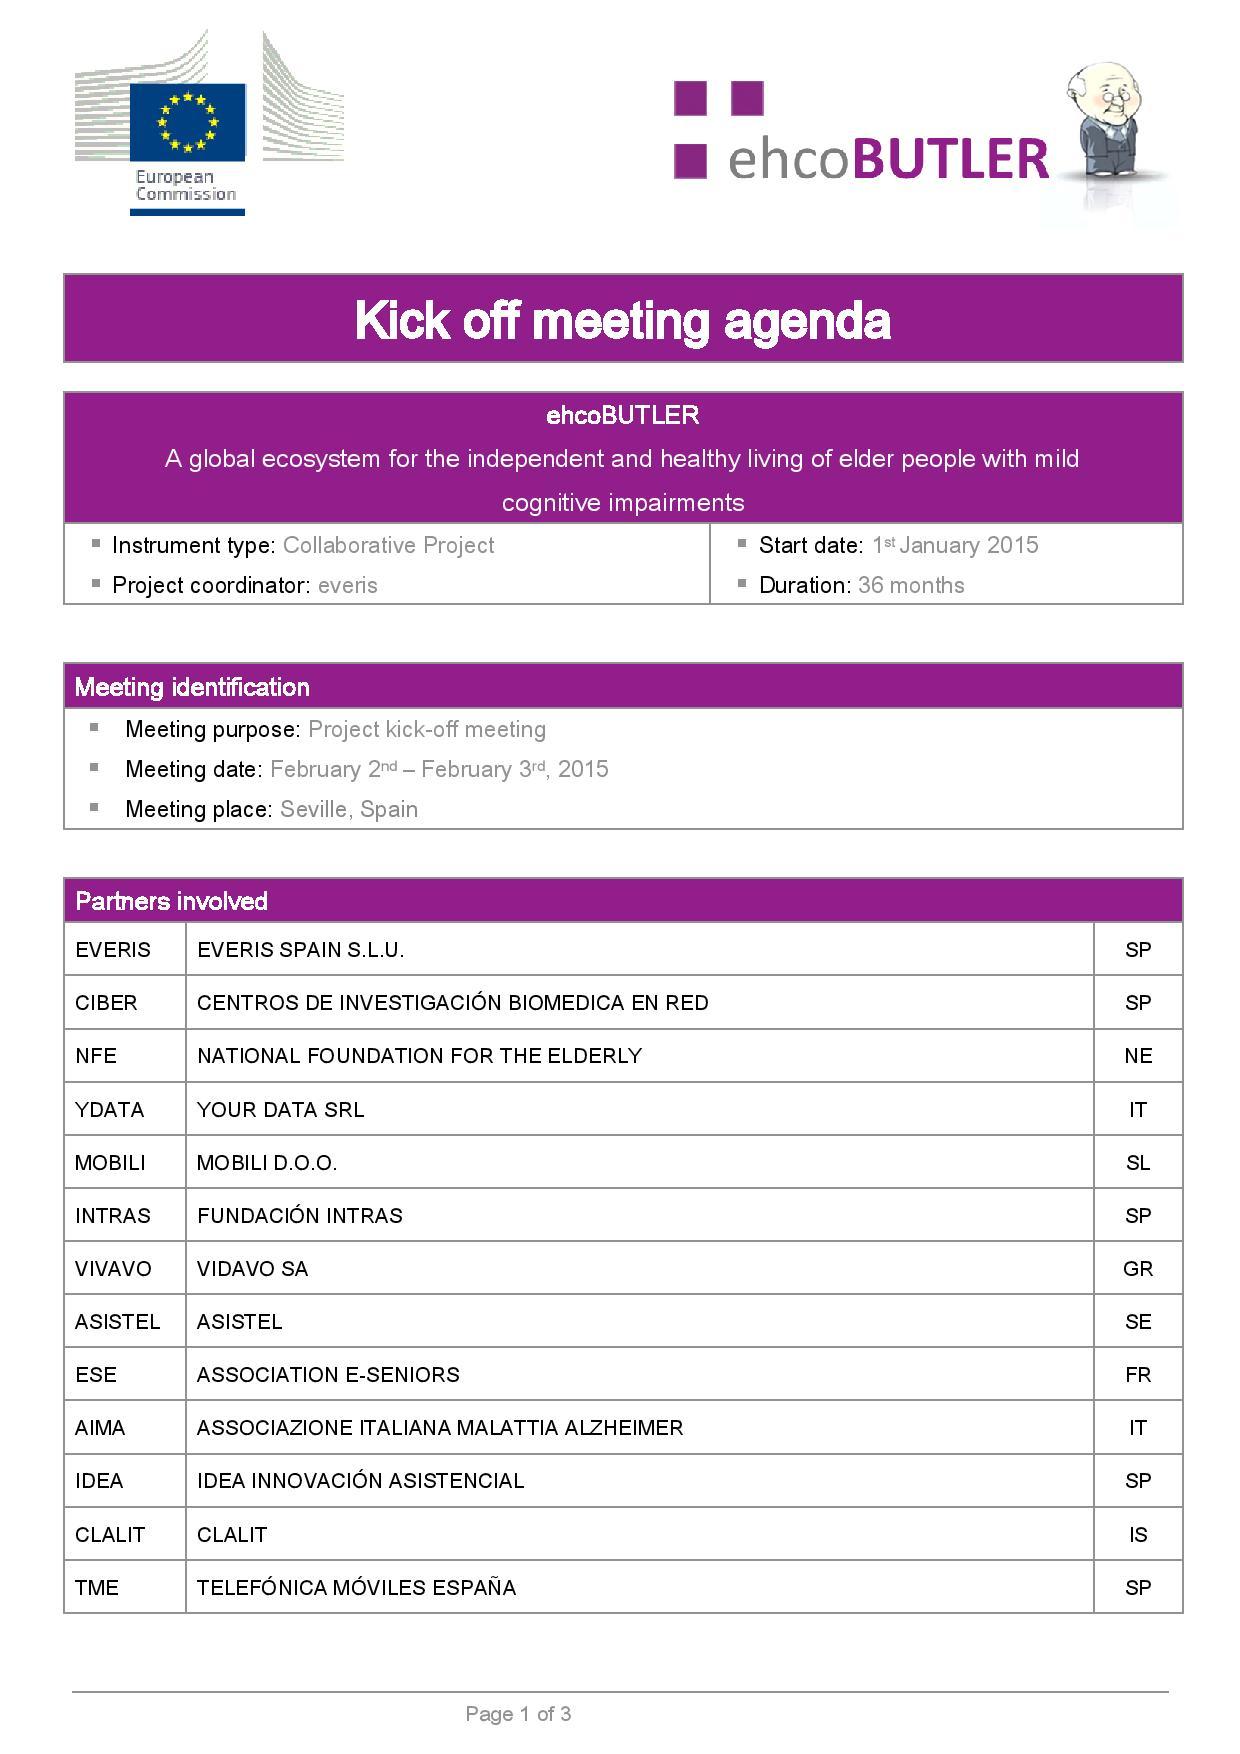 ehcoButler_kick off meeting_02-03 Feb_v2-page-001